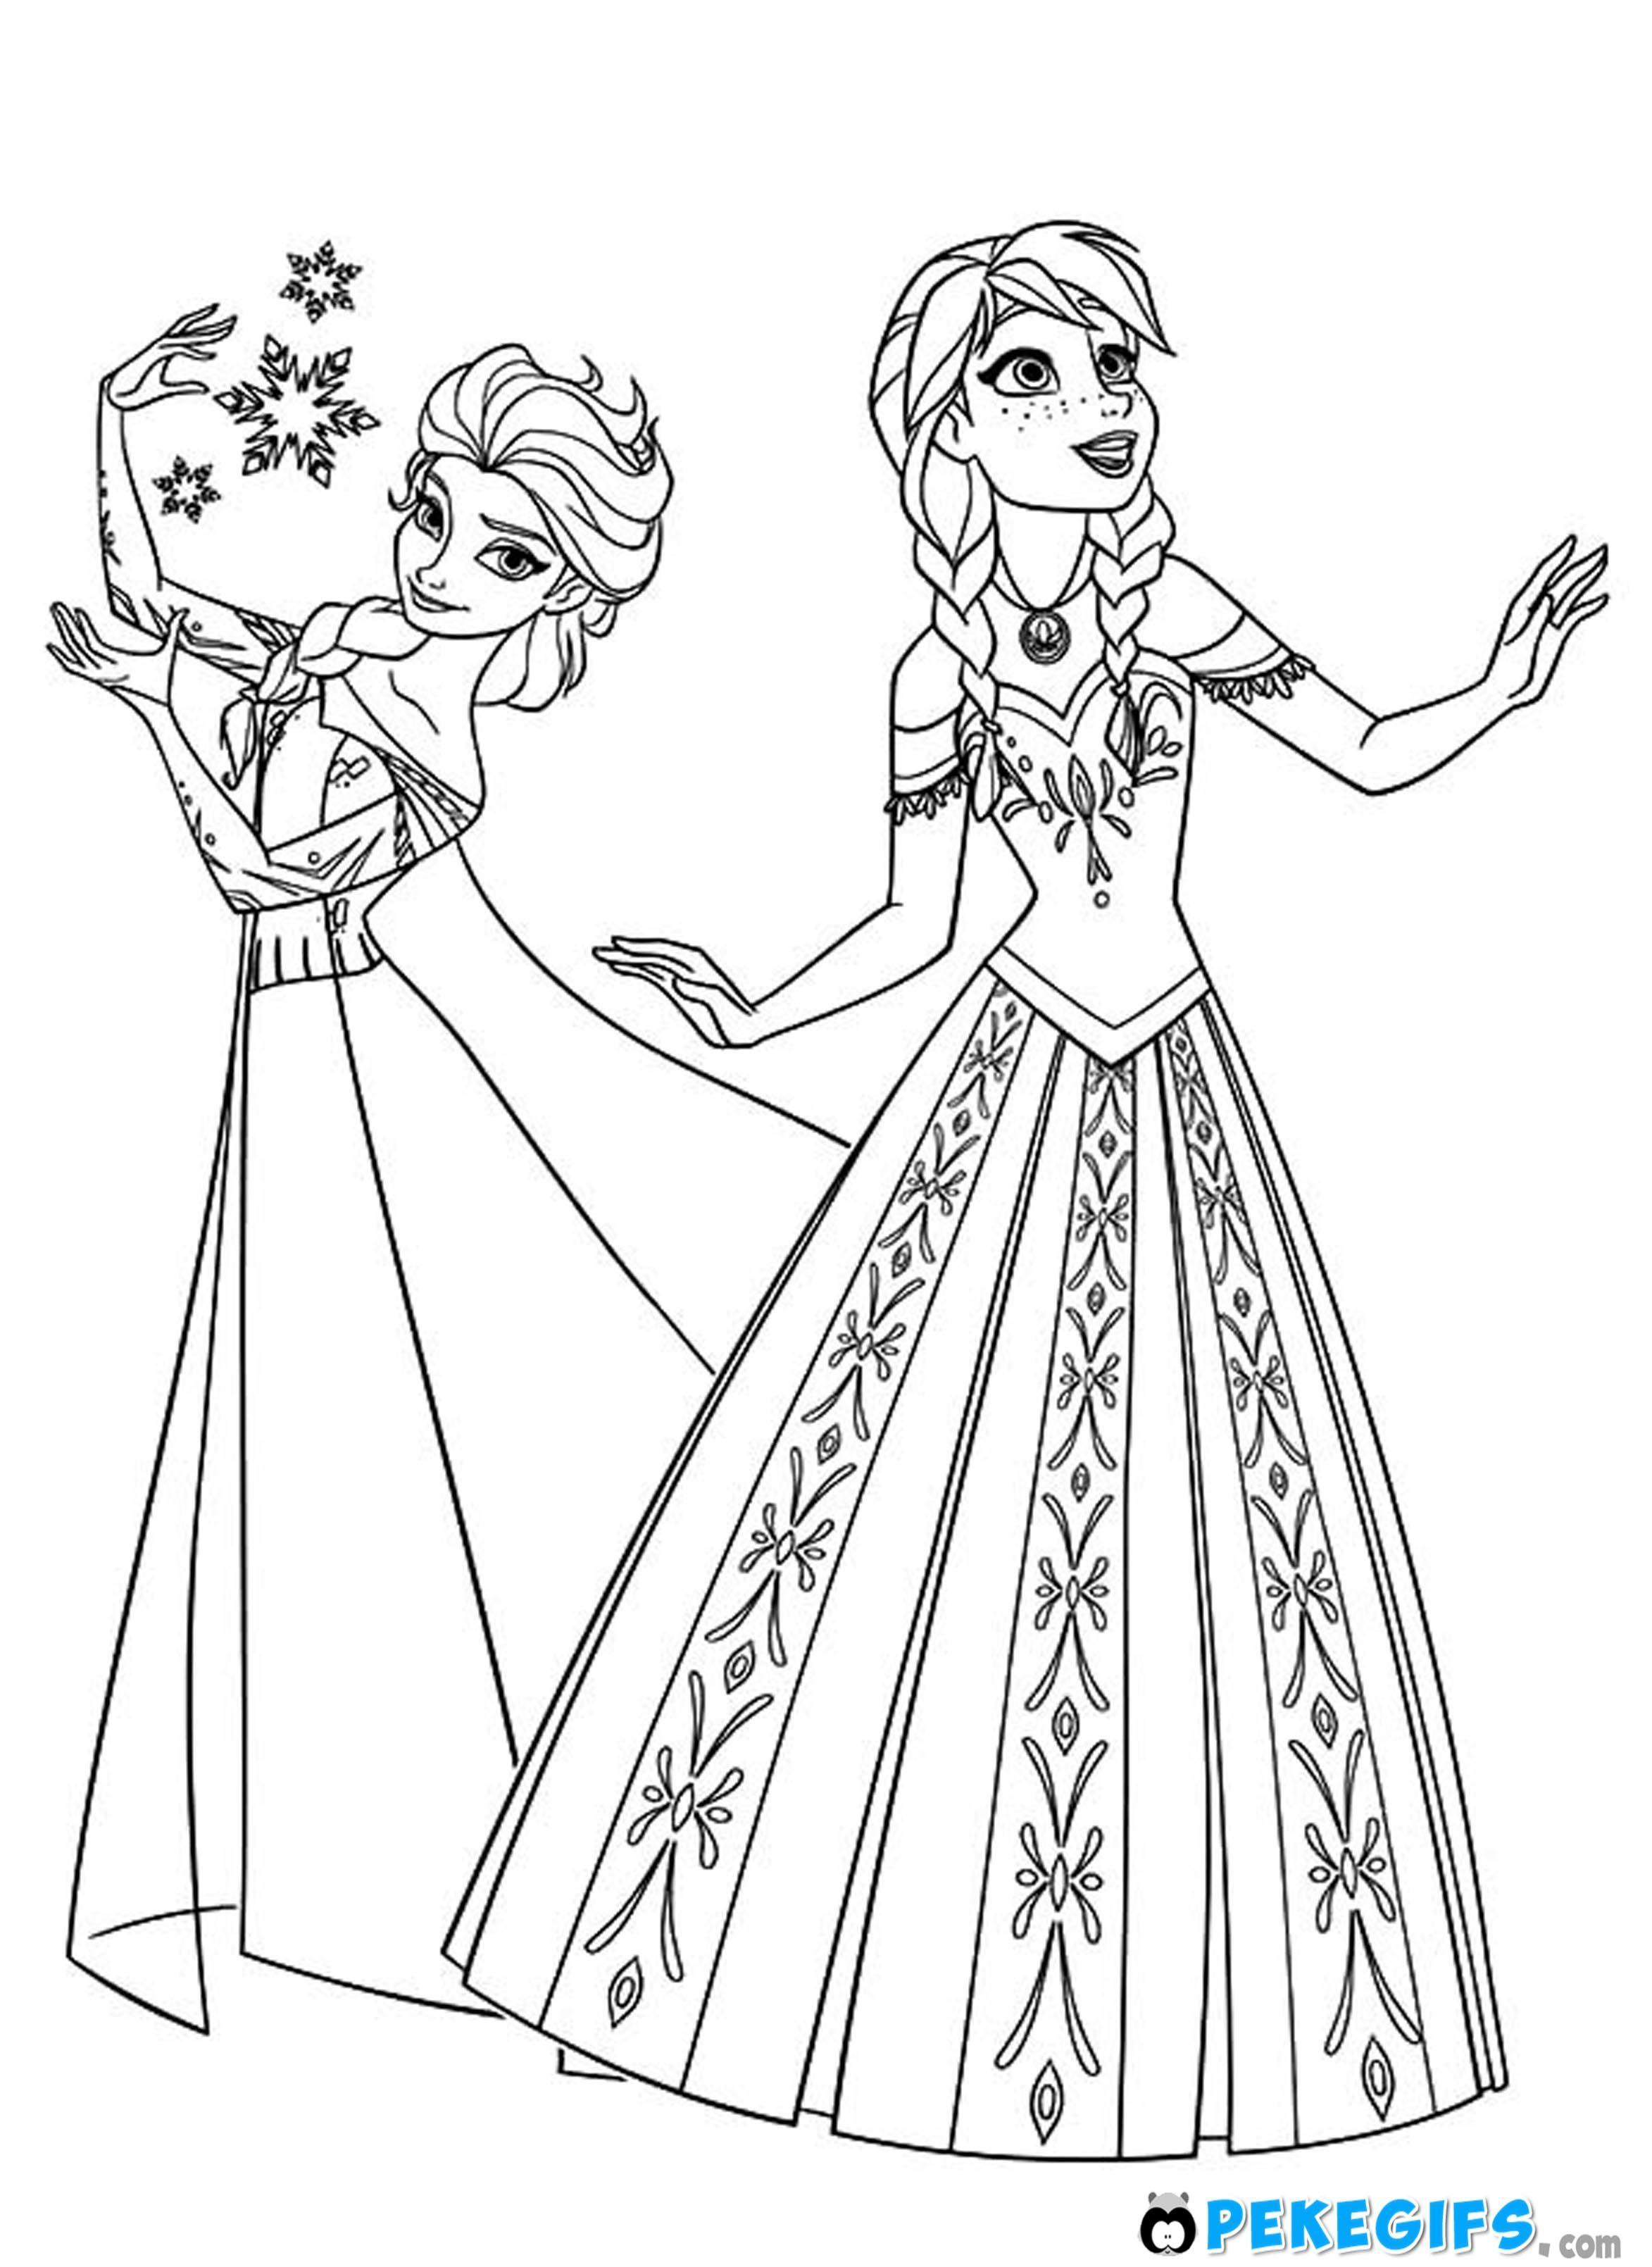 Dibujo colorear Frozen 18 | Dibujos | Pinterest | Frozen, Colorear y ...